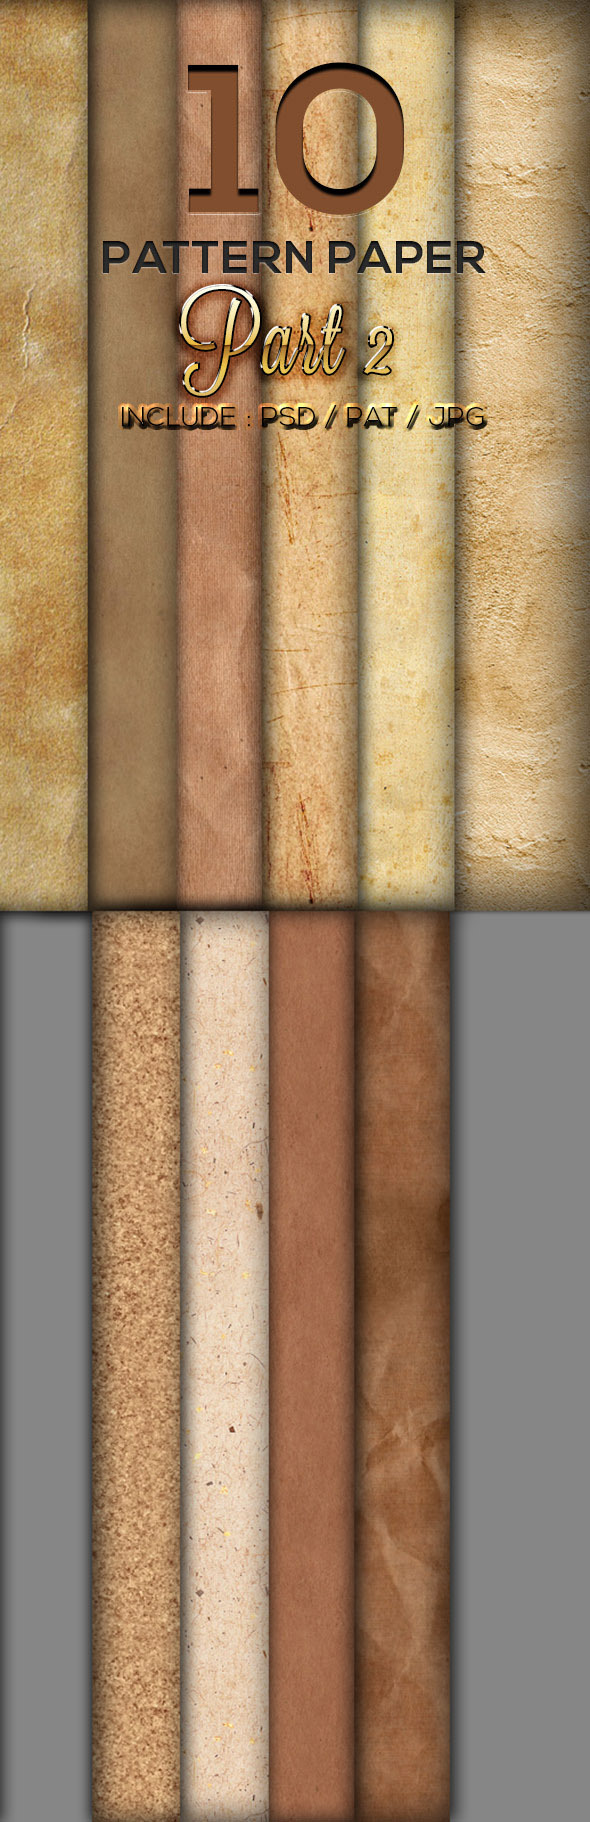 10 Paper Texture Part 2 - Textures / Fills / Patterns Photoshop